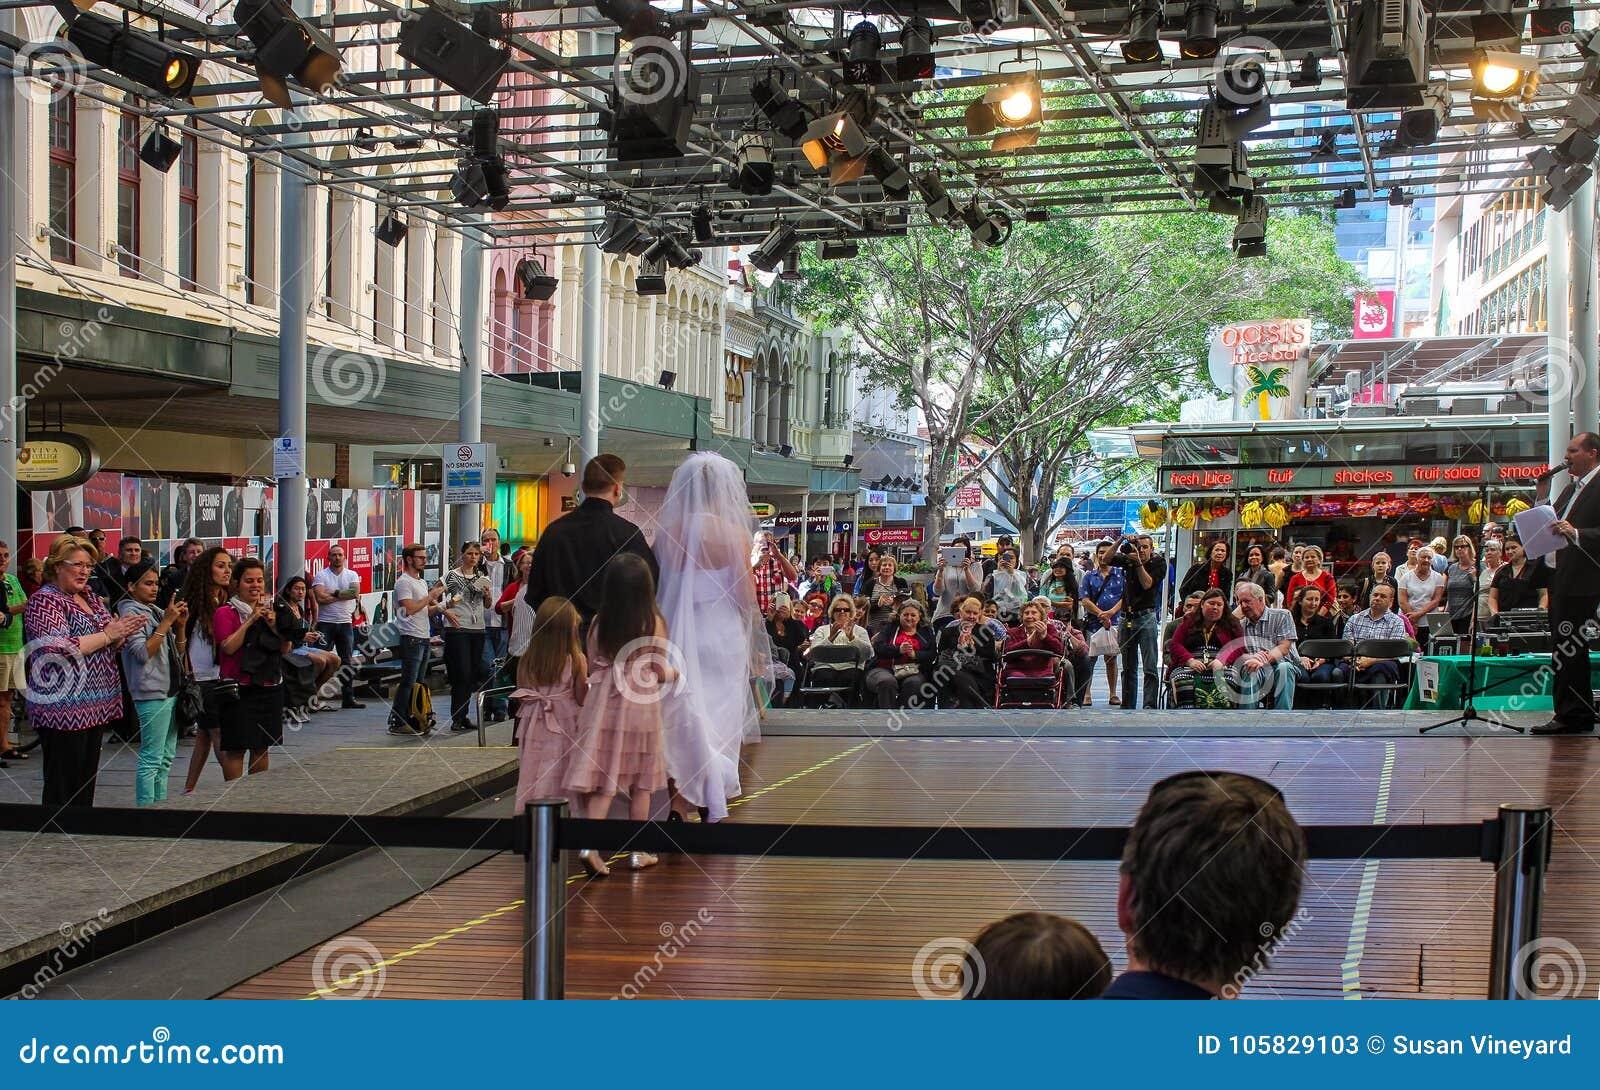 Bruids toon bij Koningin Street Mall in Brisbane Australië met publiek, fotograaf en ceremoniemeestercirca September 2015